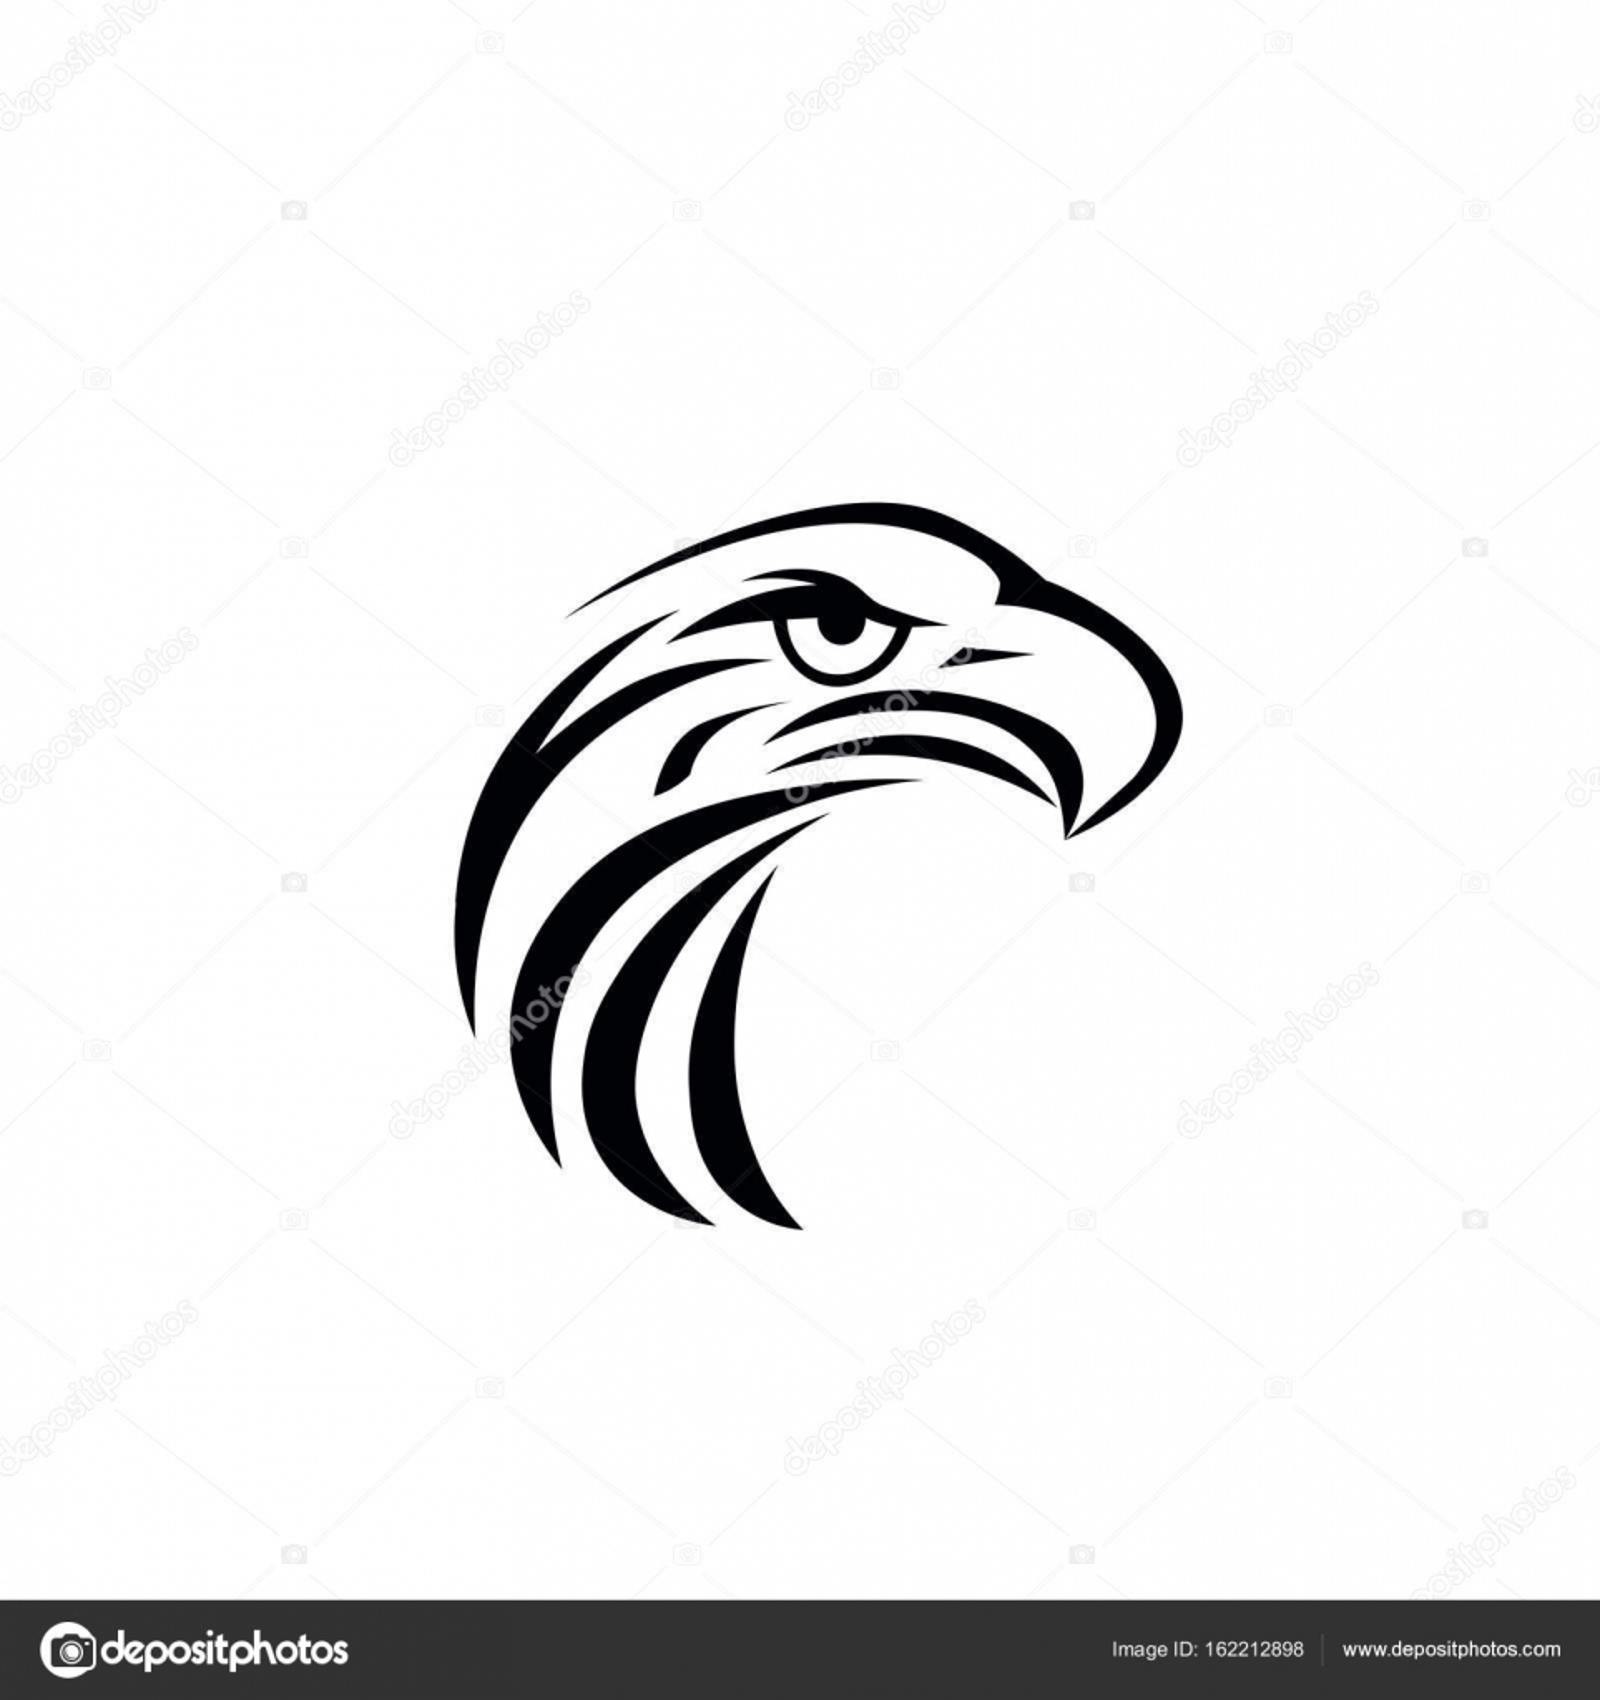 Eagle vector logo template stock vector dikiykachap1 162212898 eagle icon symbol of eagle hawk predator for sport team mascot company badge guard service hunting club label vector by dikiykachap1 biocorpaavc Images